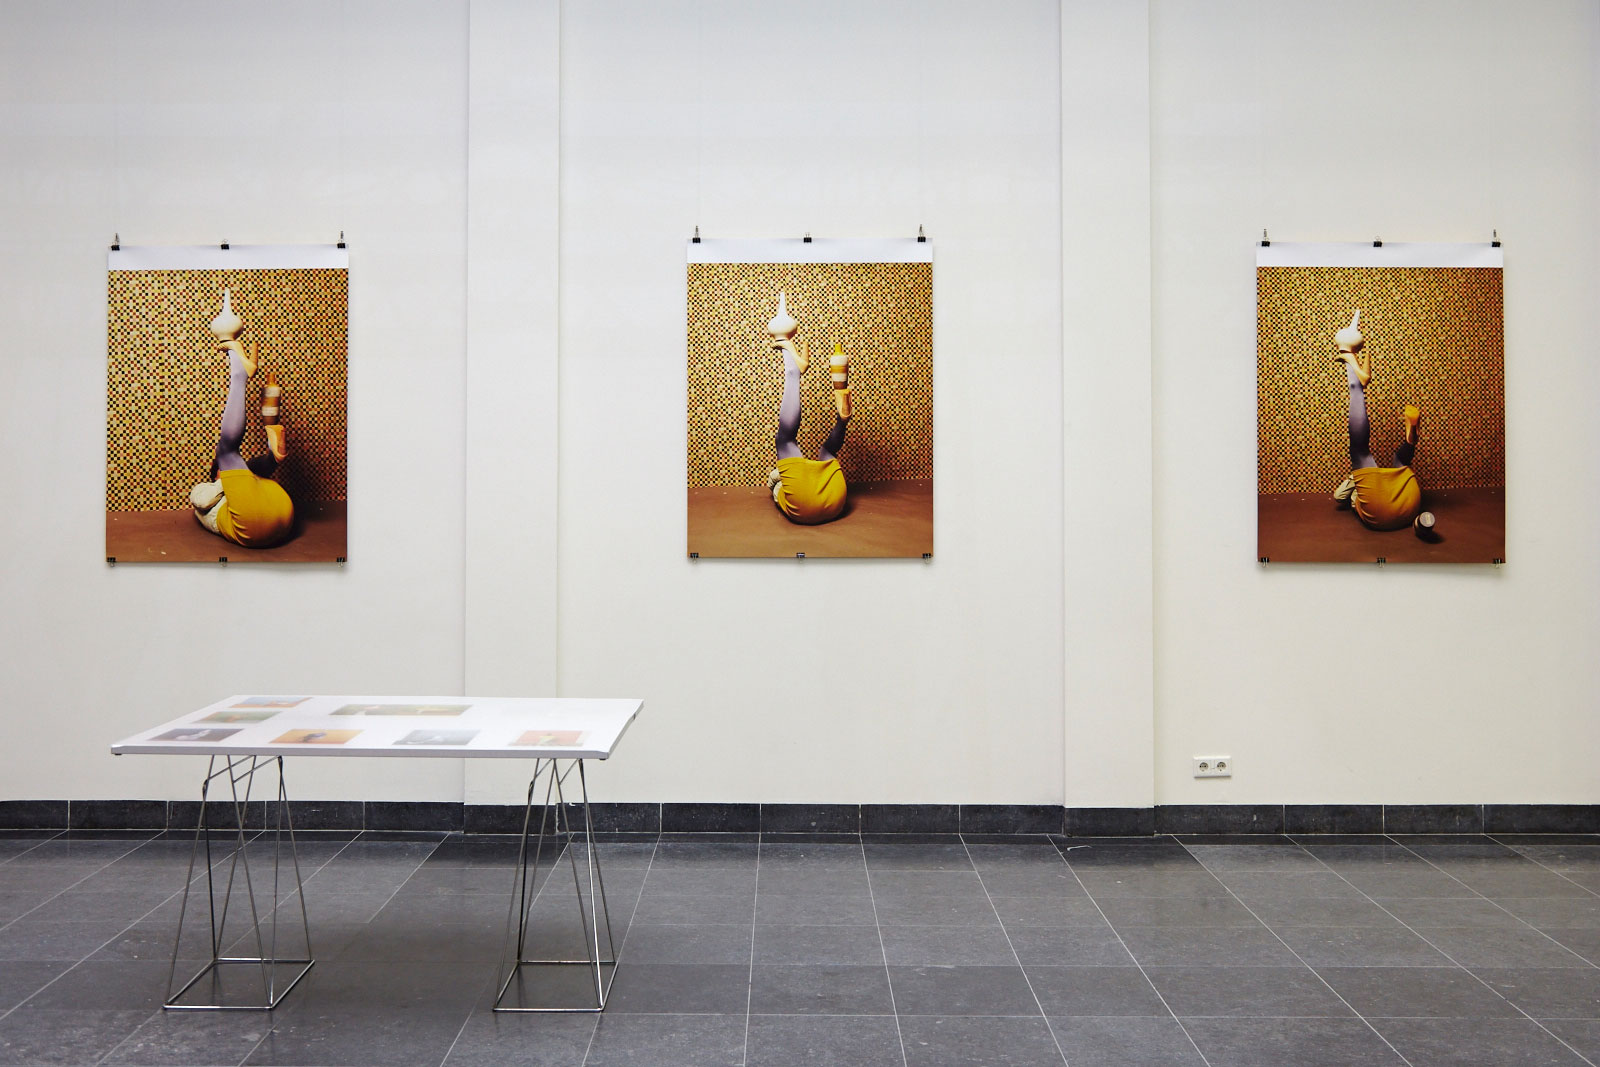 _MG_0772©2014-Studio-Johan-Nieuwenhuize-1